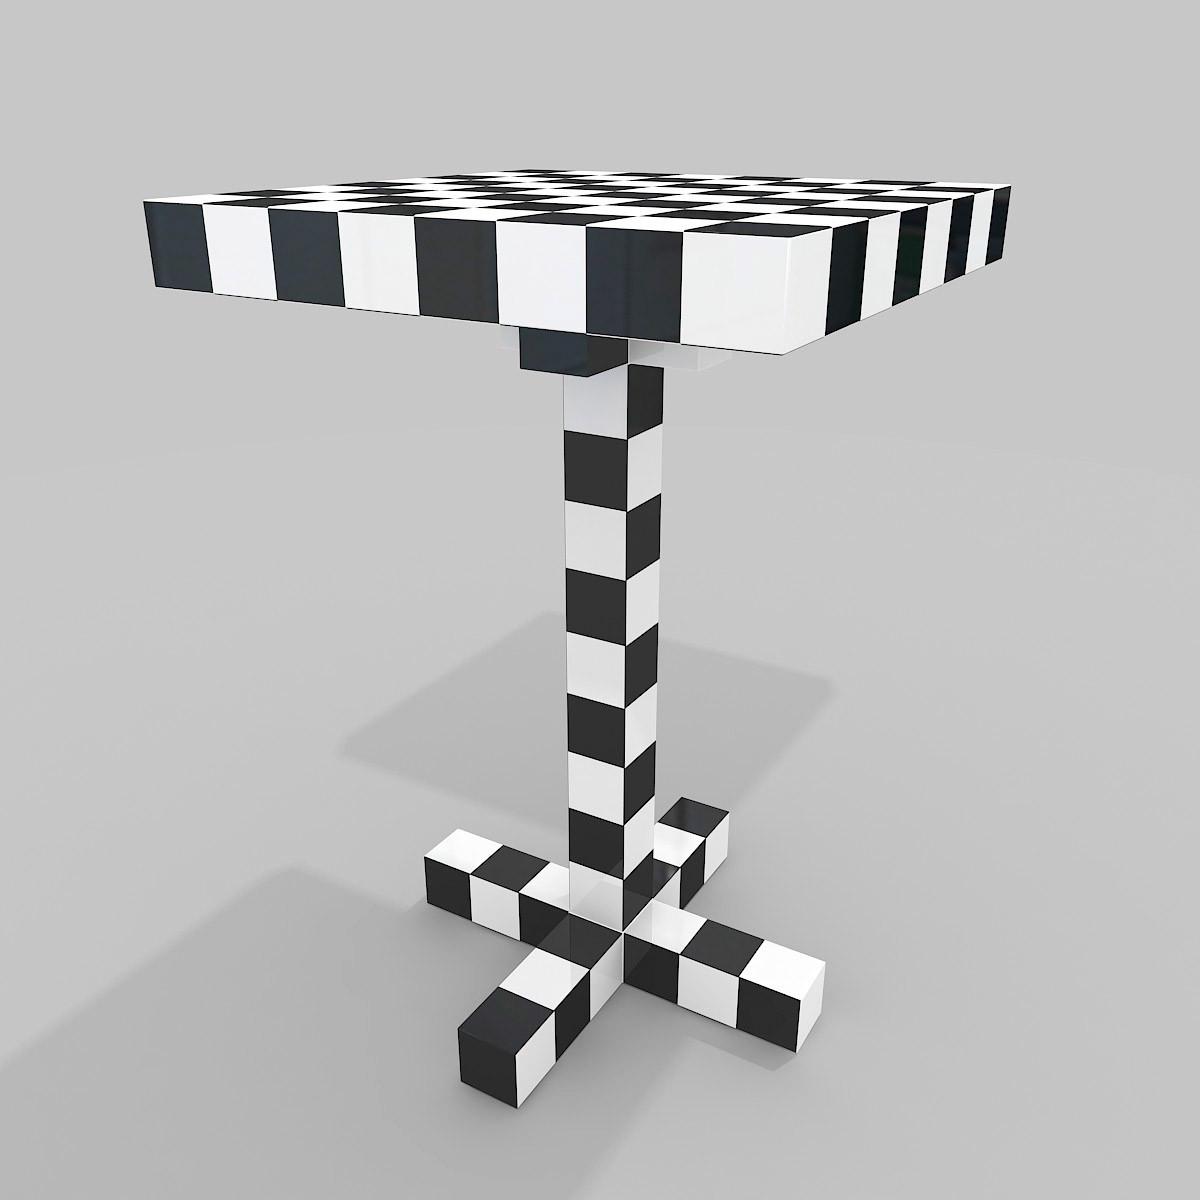 Marvelous Moooi Table Chess